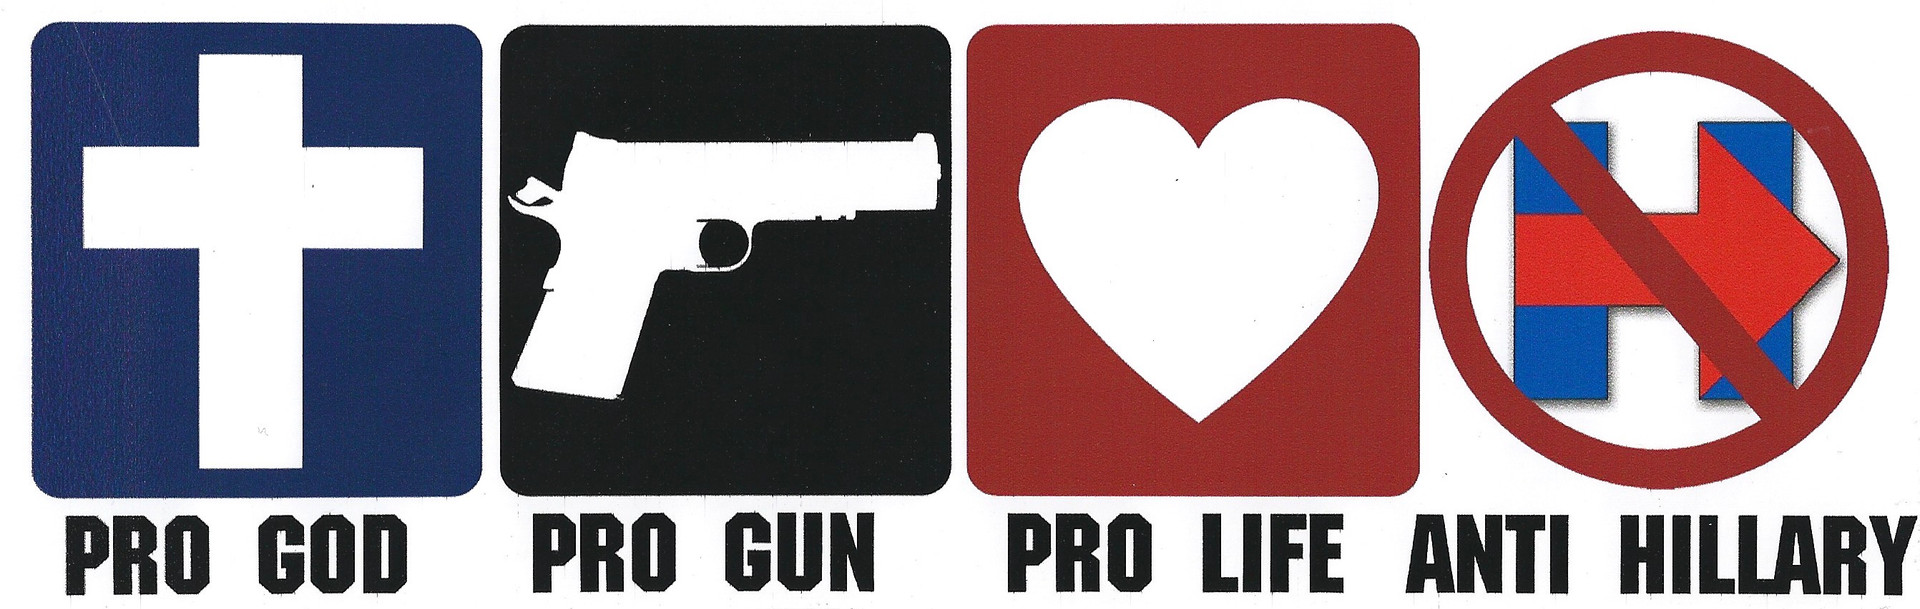 Pro God, Pro Gun, Pro Life, Anti Hillary